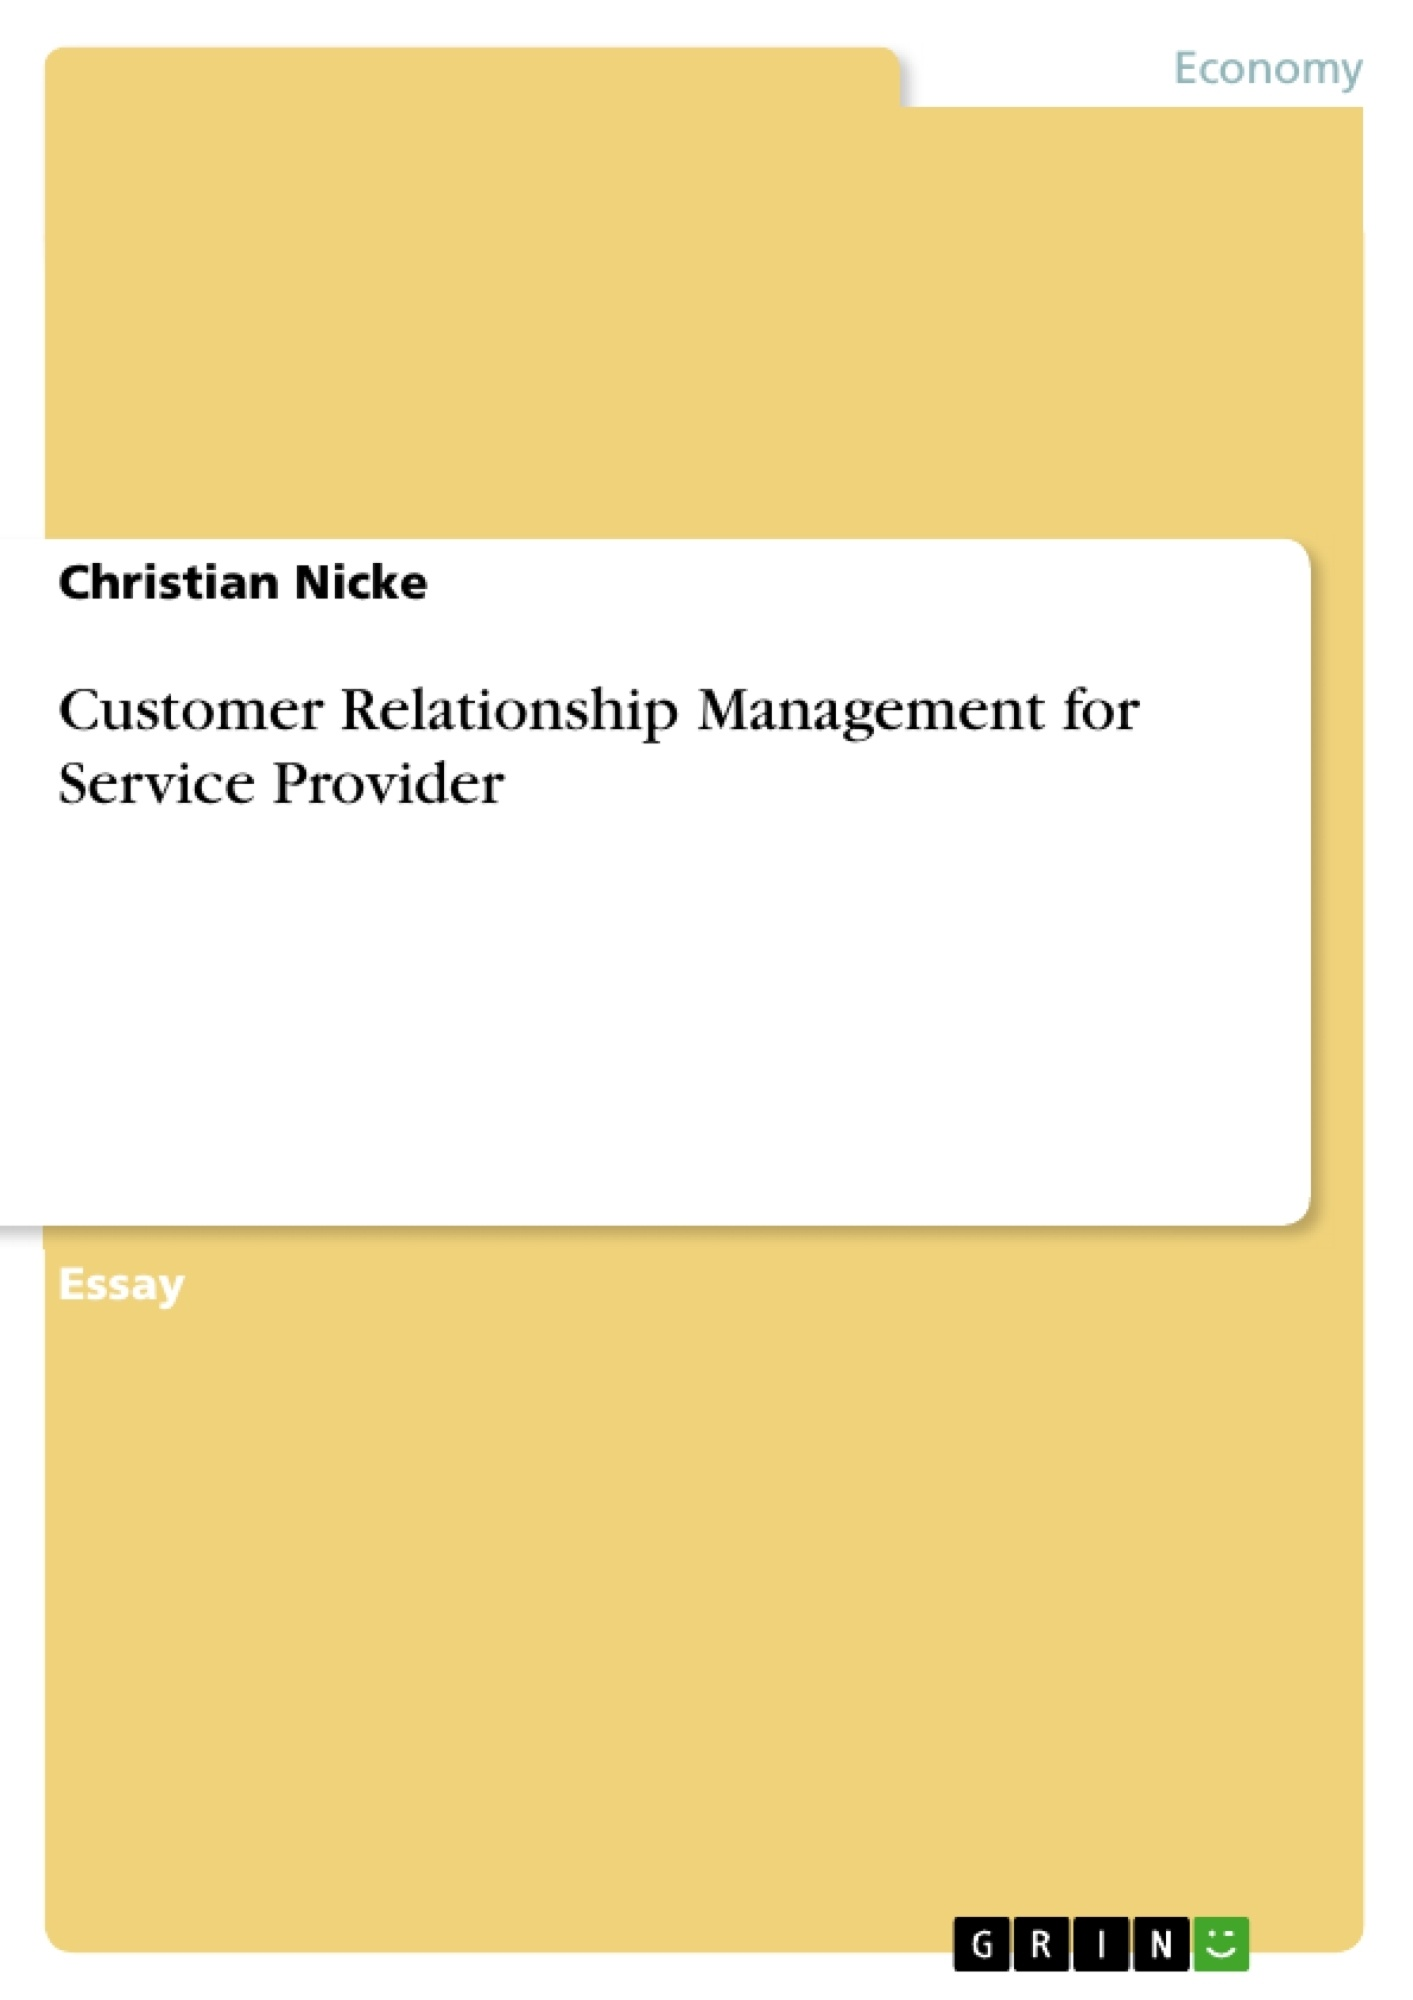 term paper on customer service